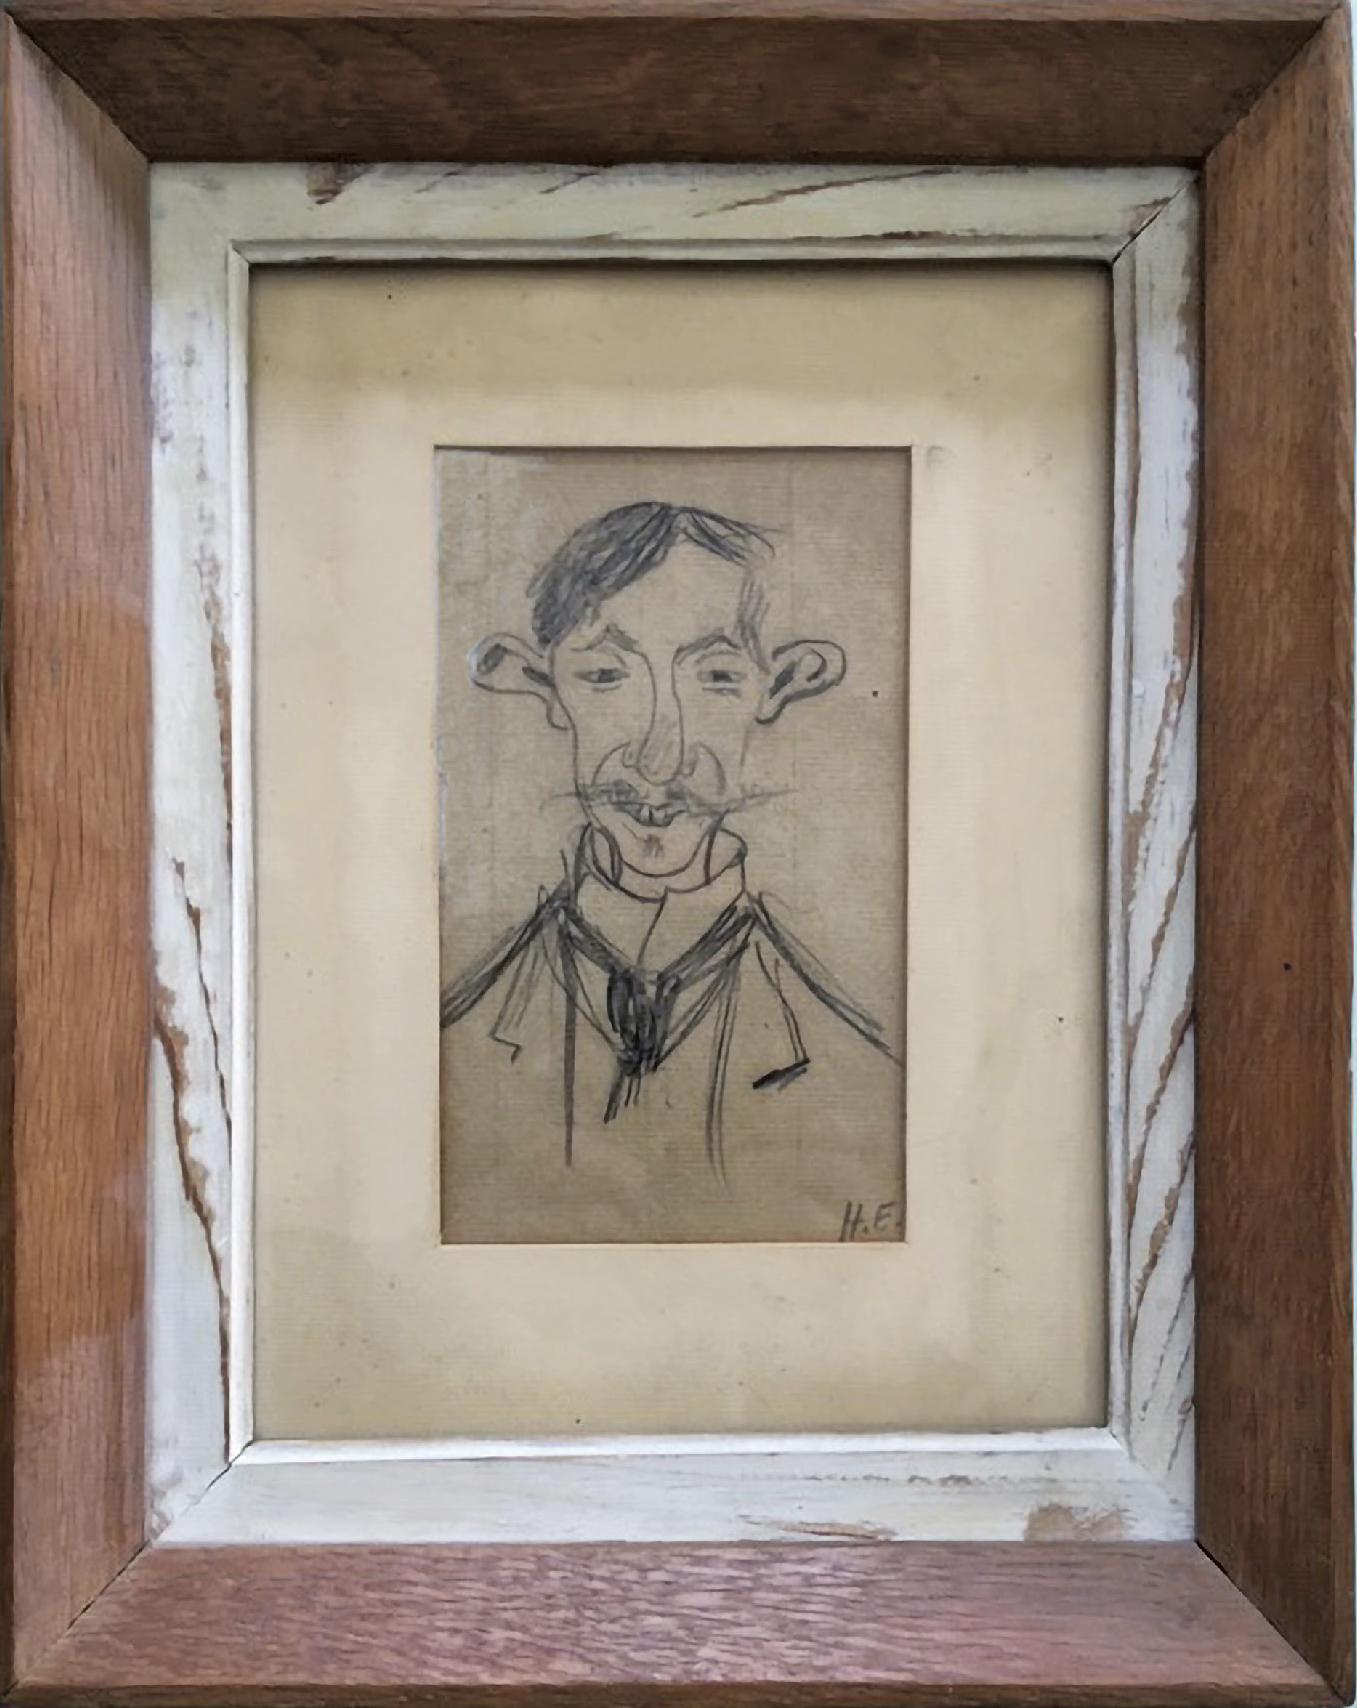 Lot 88 - Evenepoel Henri (1872-1899) Sketch of Mr Crespin a Brussels Glassblower - Drawing - [...]